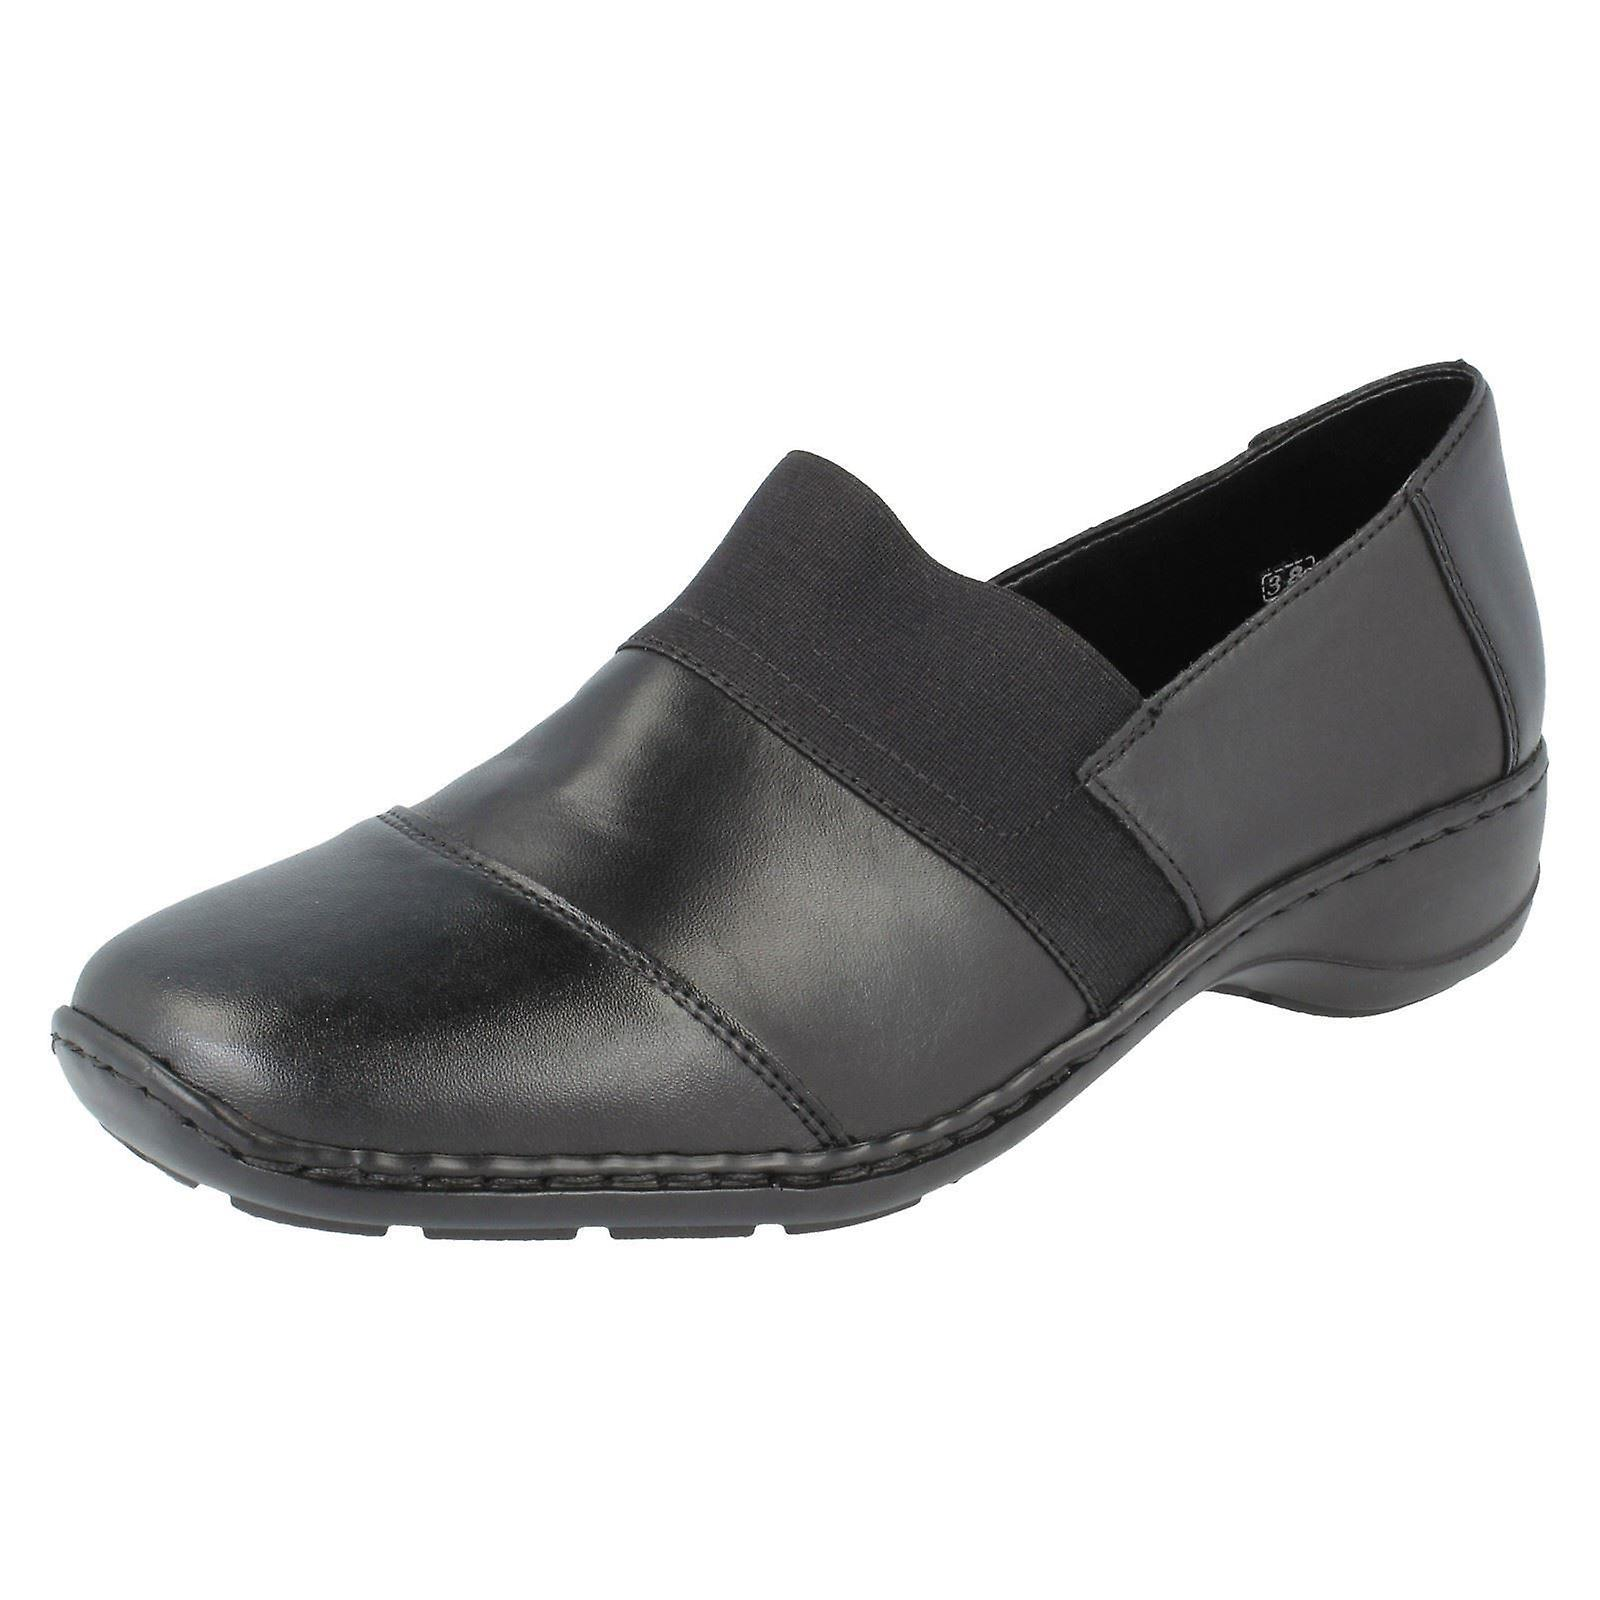 Damen Rieker flache Schuhe 58355-00 - Black - UK Size 4 - EU Größe 37 - Größe 6